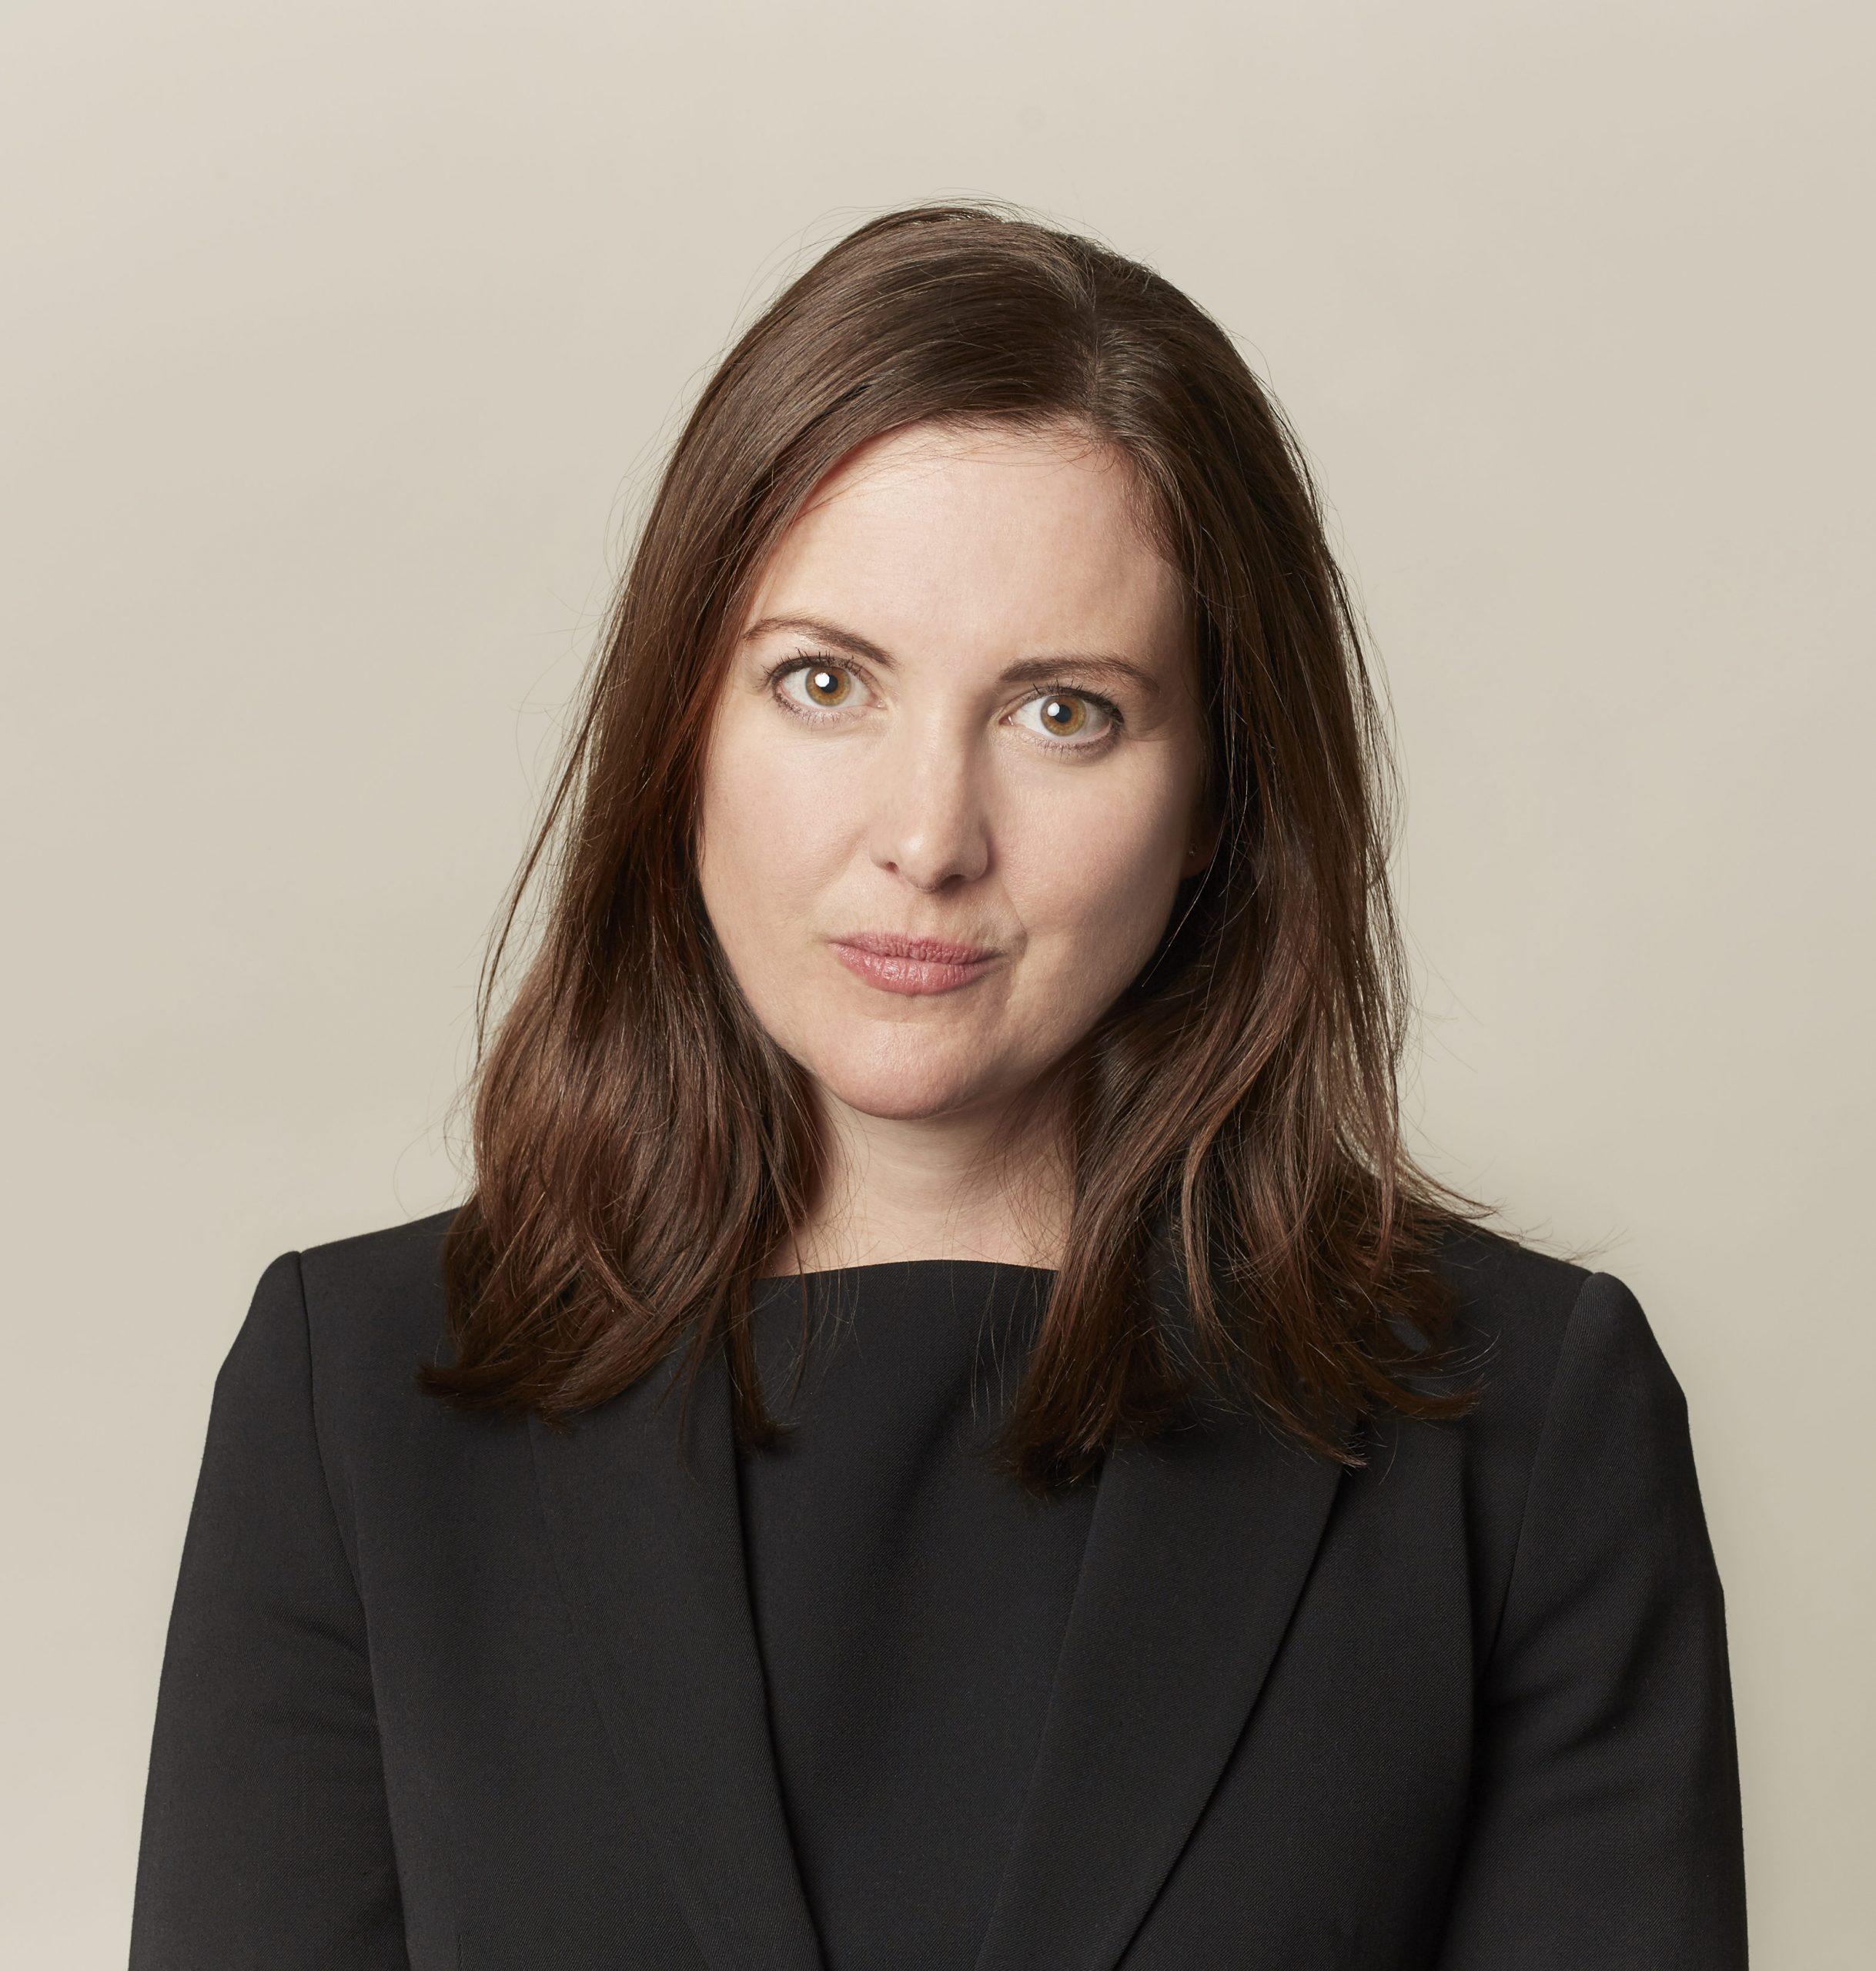 Catherine Silverton